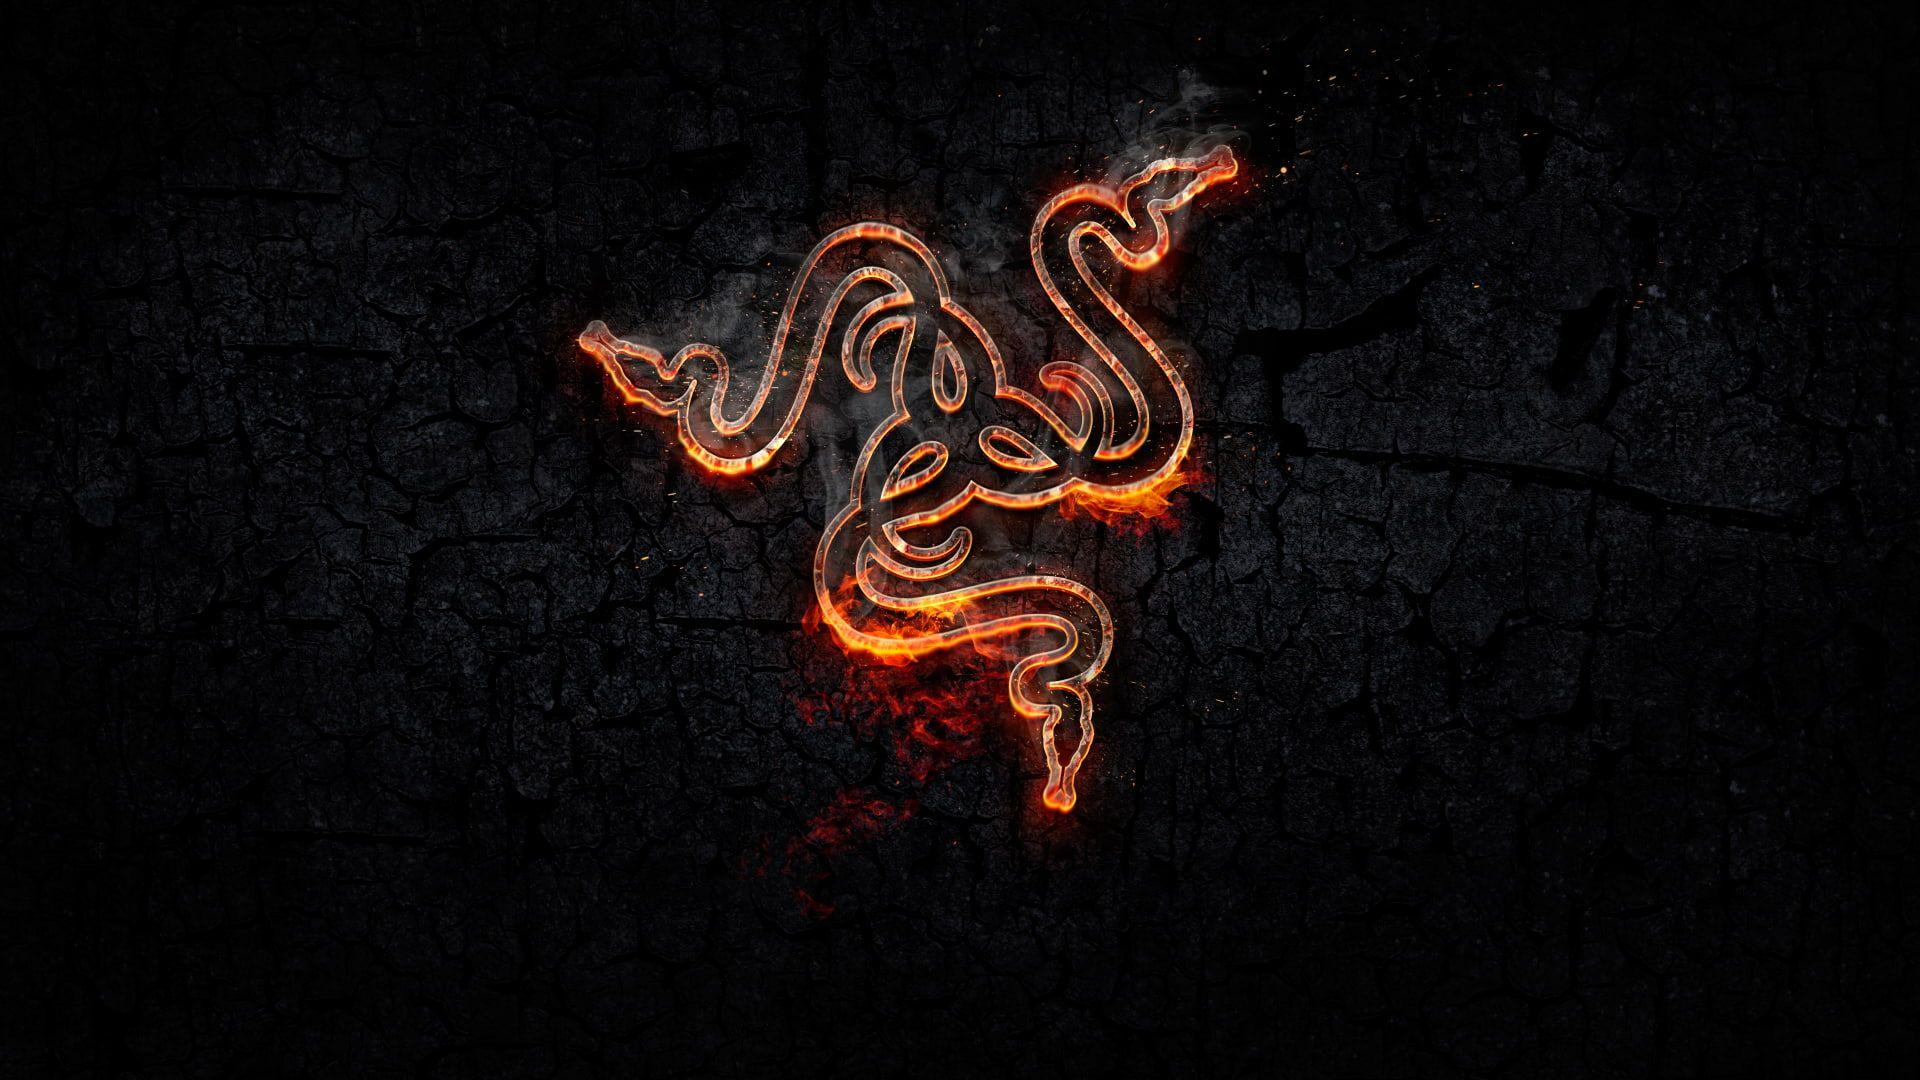 Razer Inc Razer Logo Snake Gaming Series Orange 1080p Wallpaper Hdwallpaper Desktop Black Phone Wallpaper 4k Gaming Wallpaper Razer